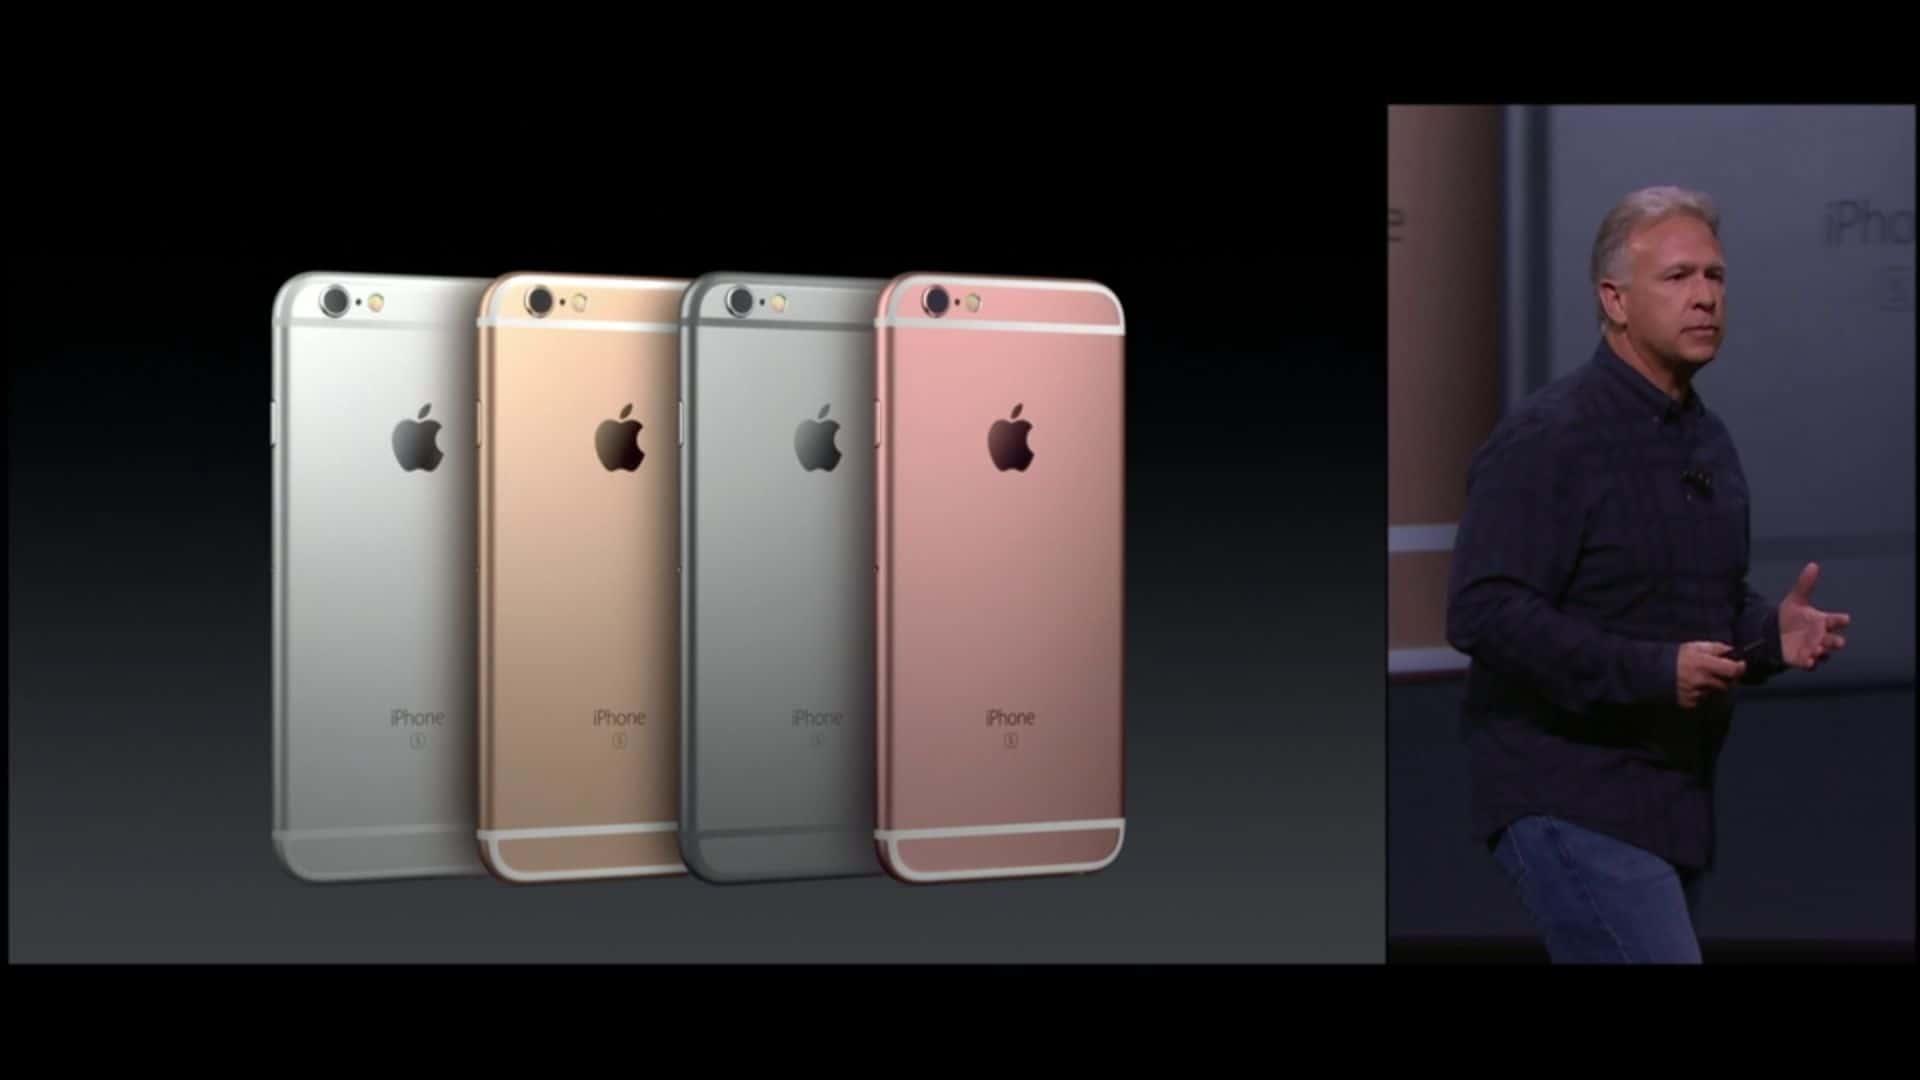 iphone6s_barvy